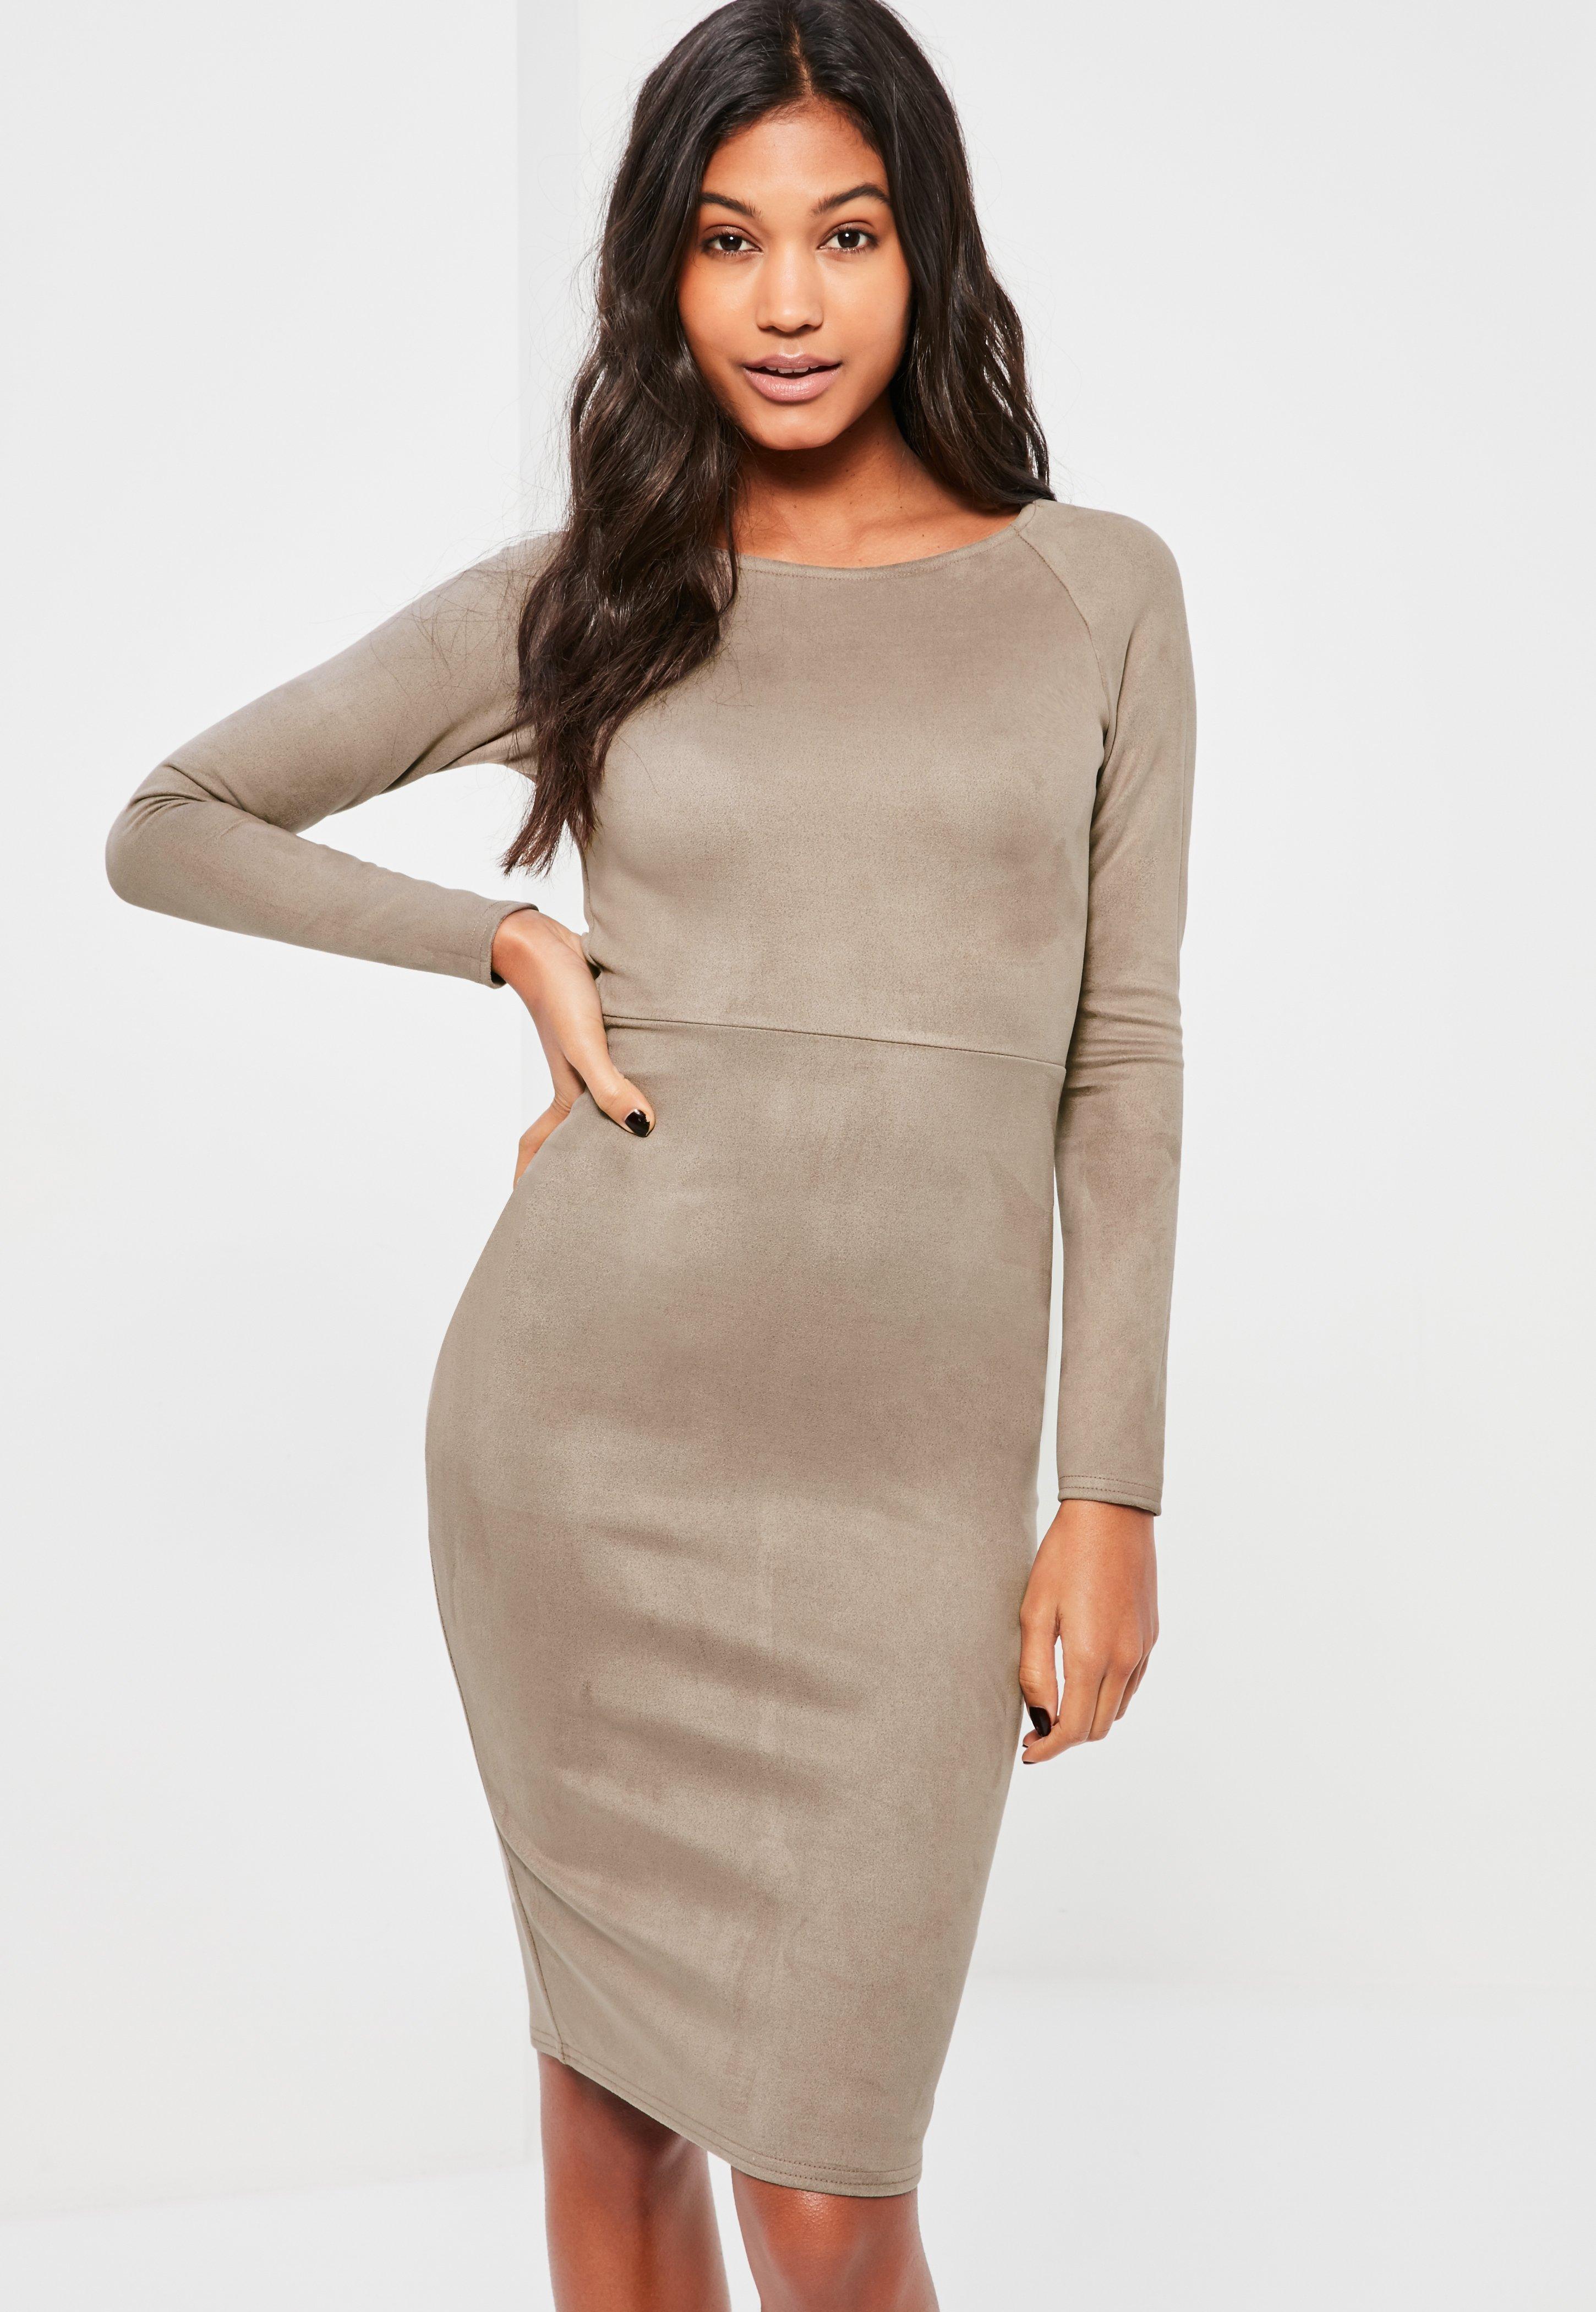 Grey Bonded Suede Buckle Back Midi Dress